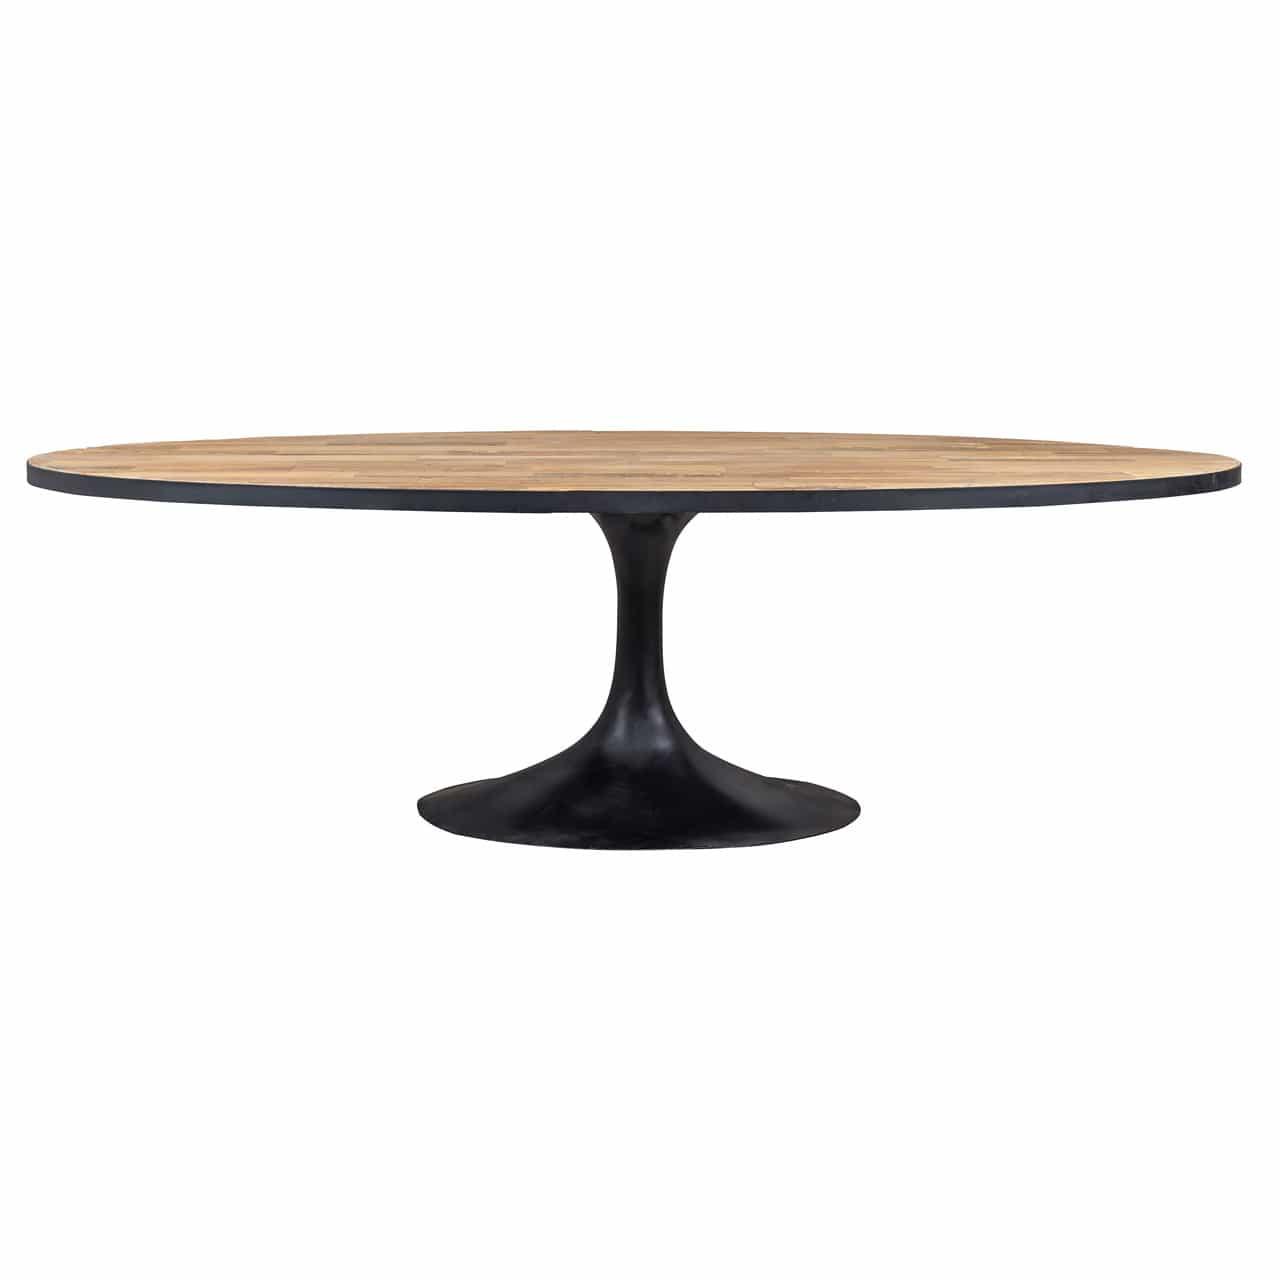 salle a manger industrielle bois metal table ovale meubles. Black Bedroom Furniture Sets. Home Design Ideas